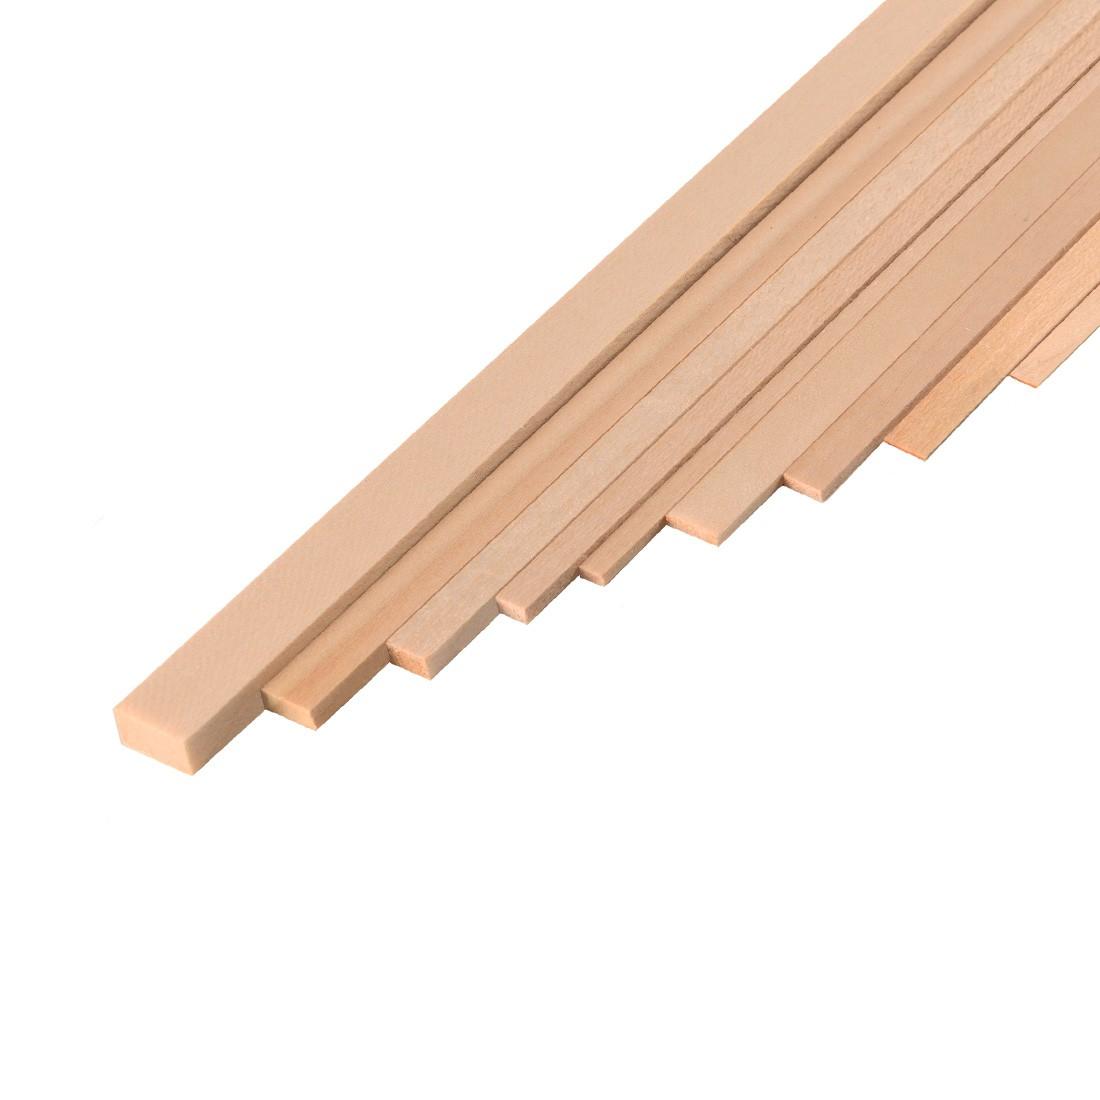 Listelli Tiglio   mm.0,5x4